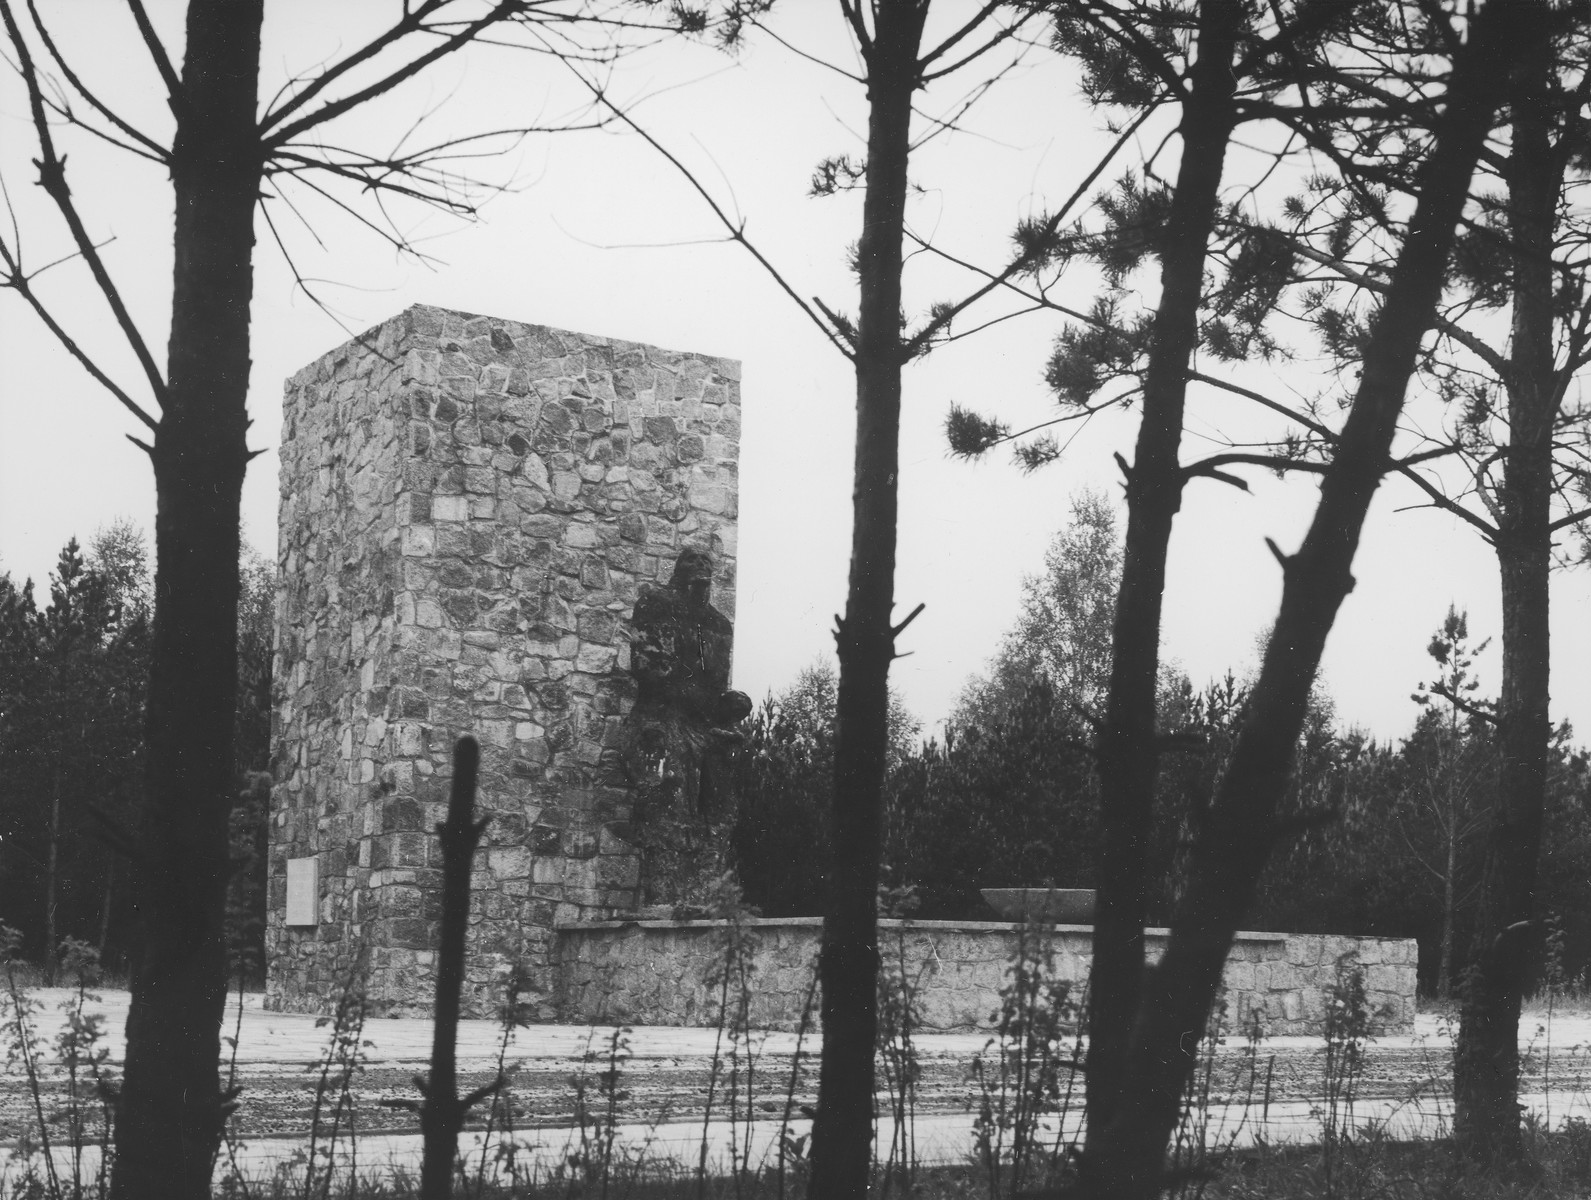 Memorial at the Sobibor concentration camp.